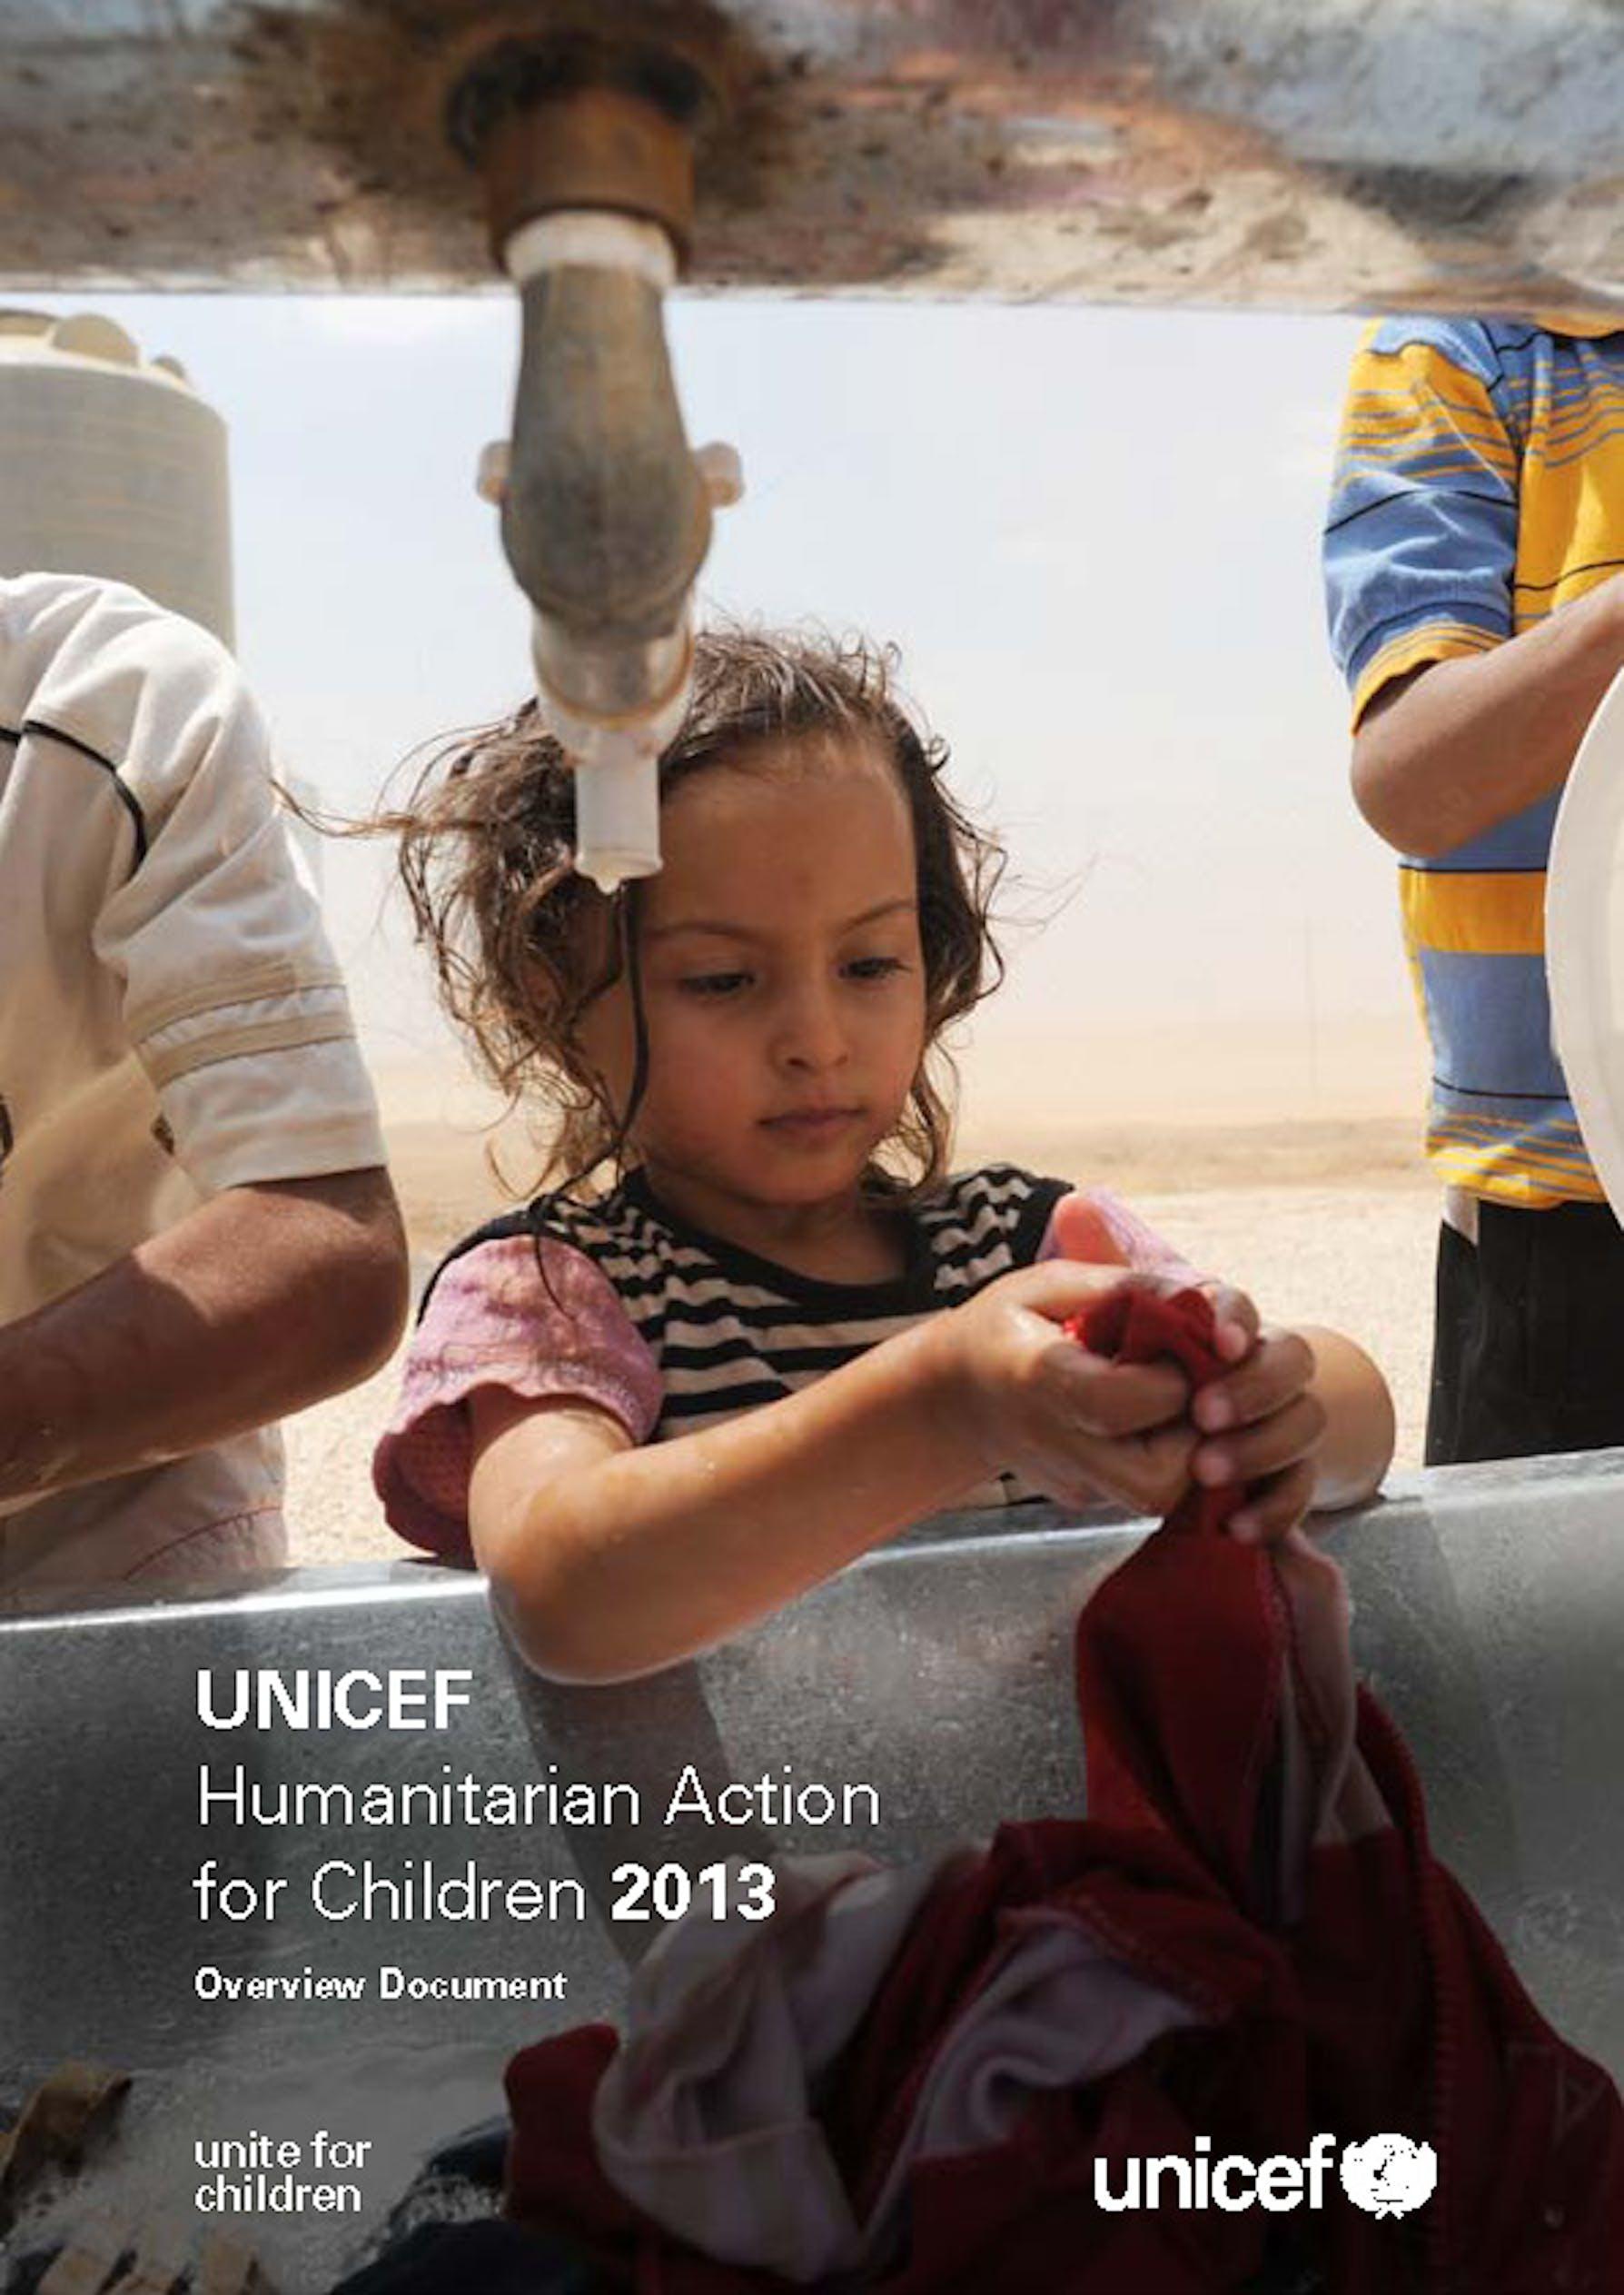 Humanitarian Action for Children 2013